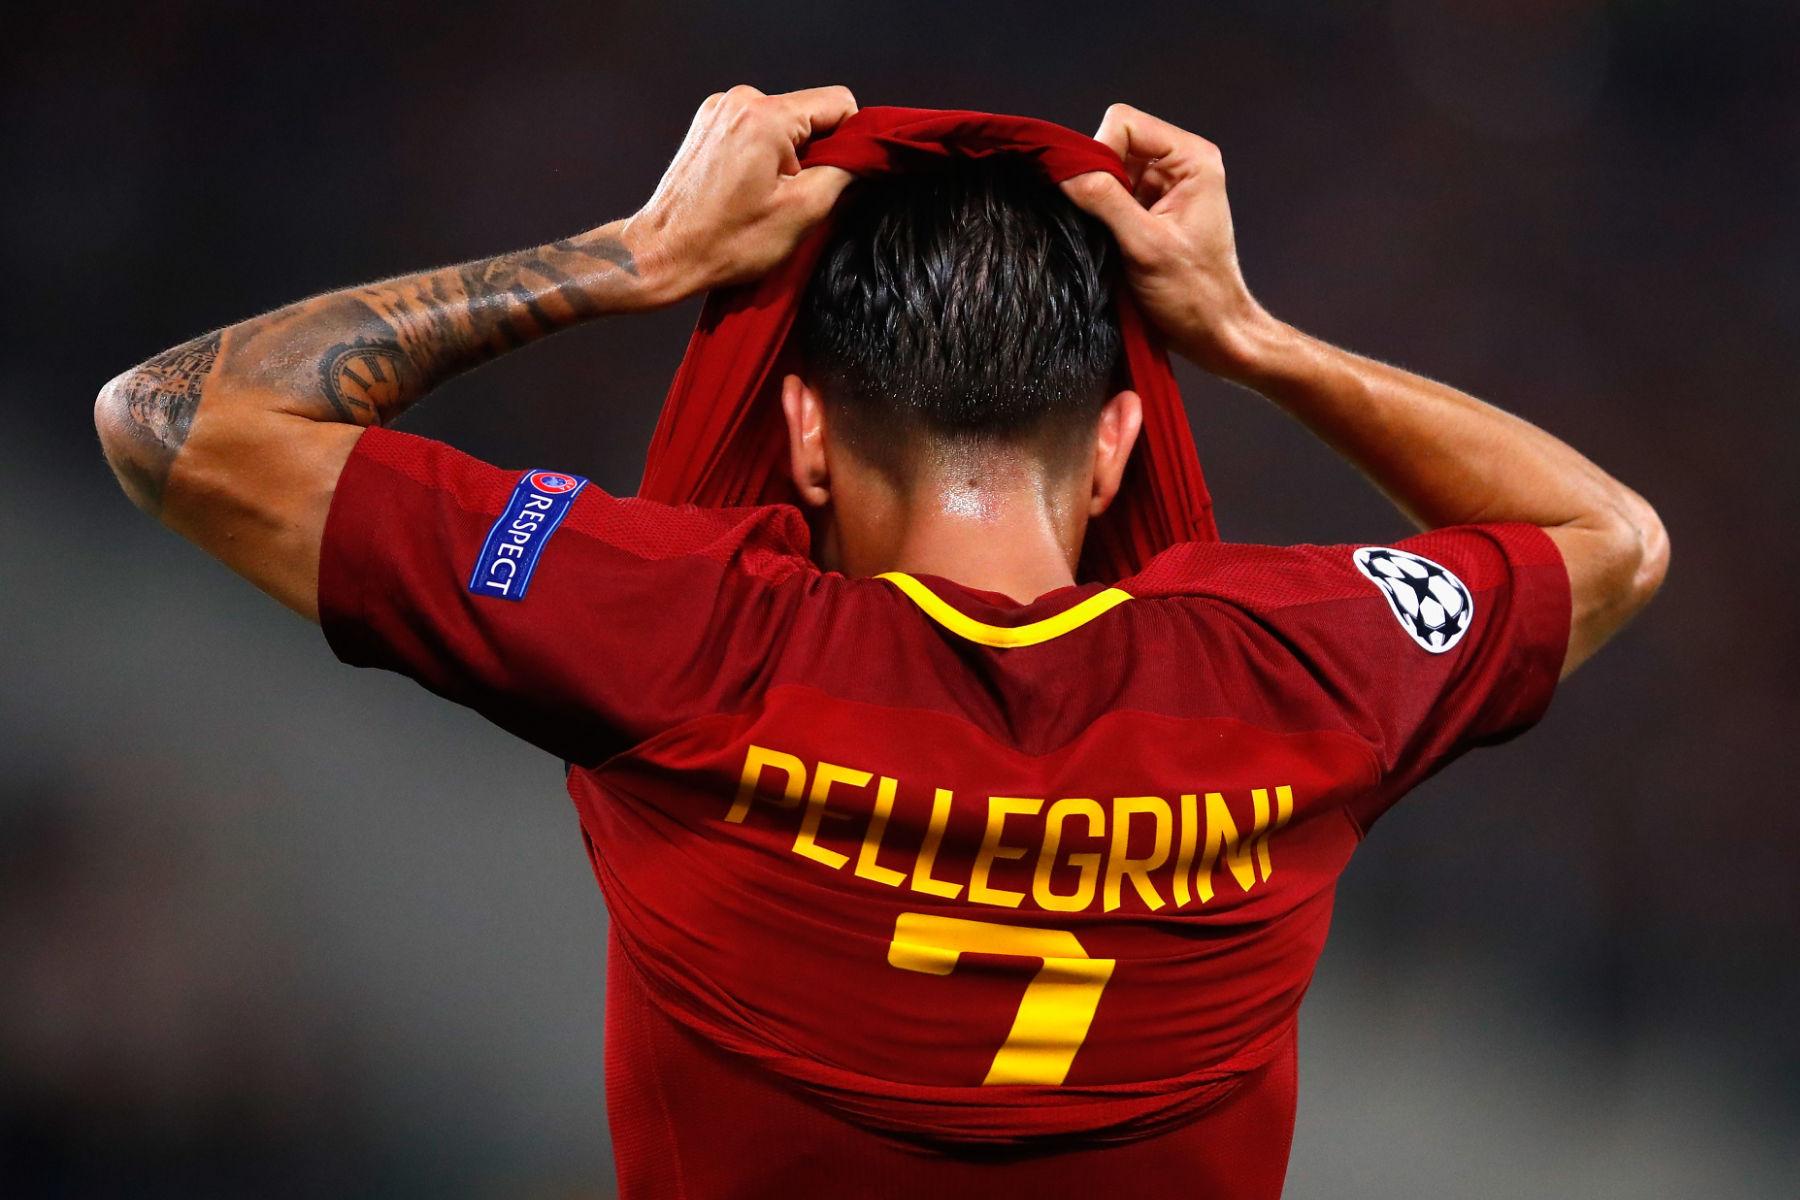 lorenzo-pellegrini-roma-vs-liverpool-champions-league-2018